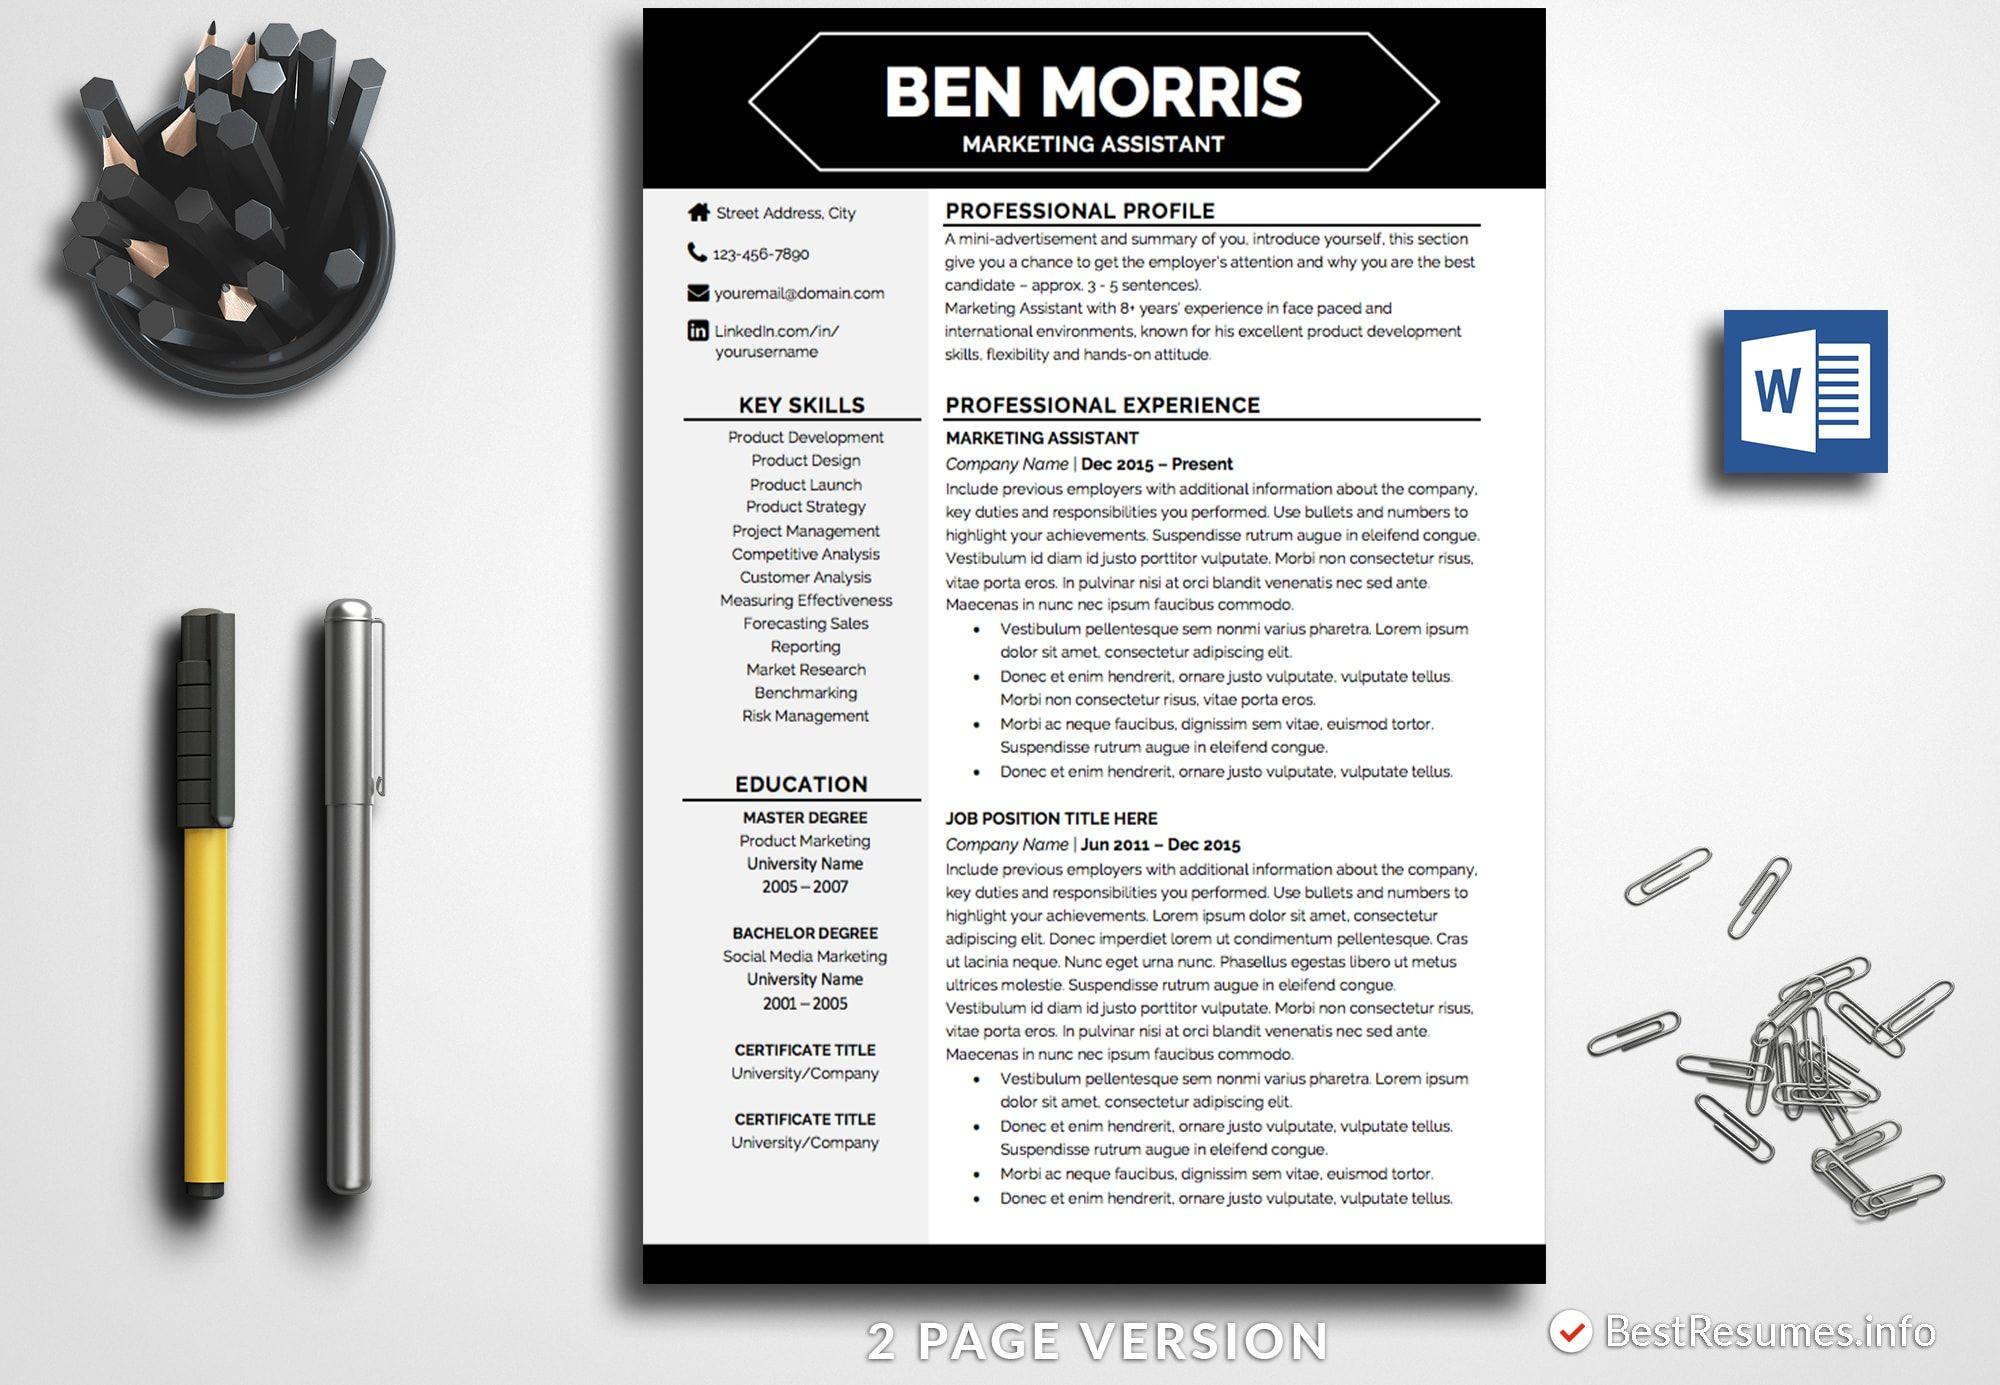 Professional Resume Template Ben Morris Bestresumes Info Resume Template Professional Resume Template Word Creative Resume Templates